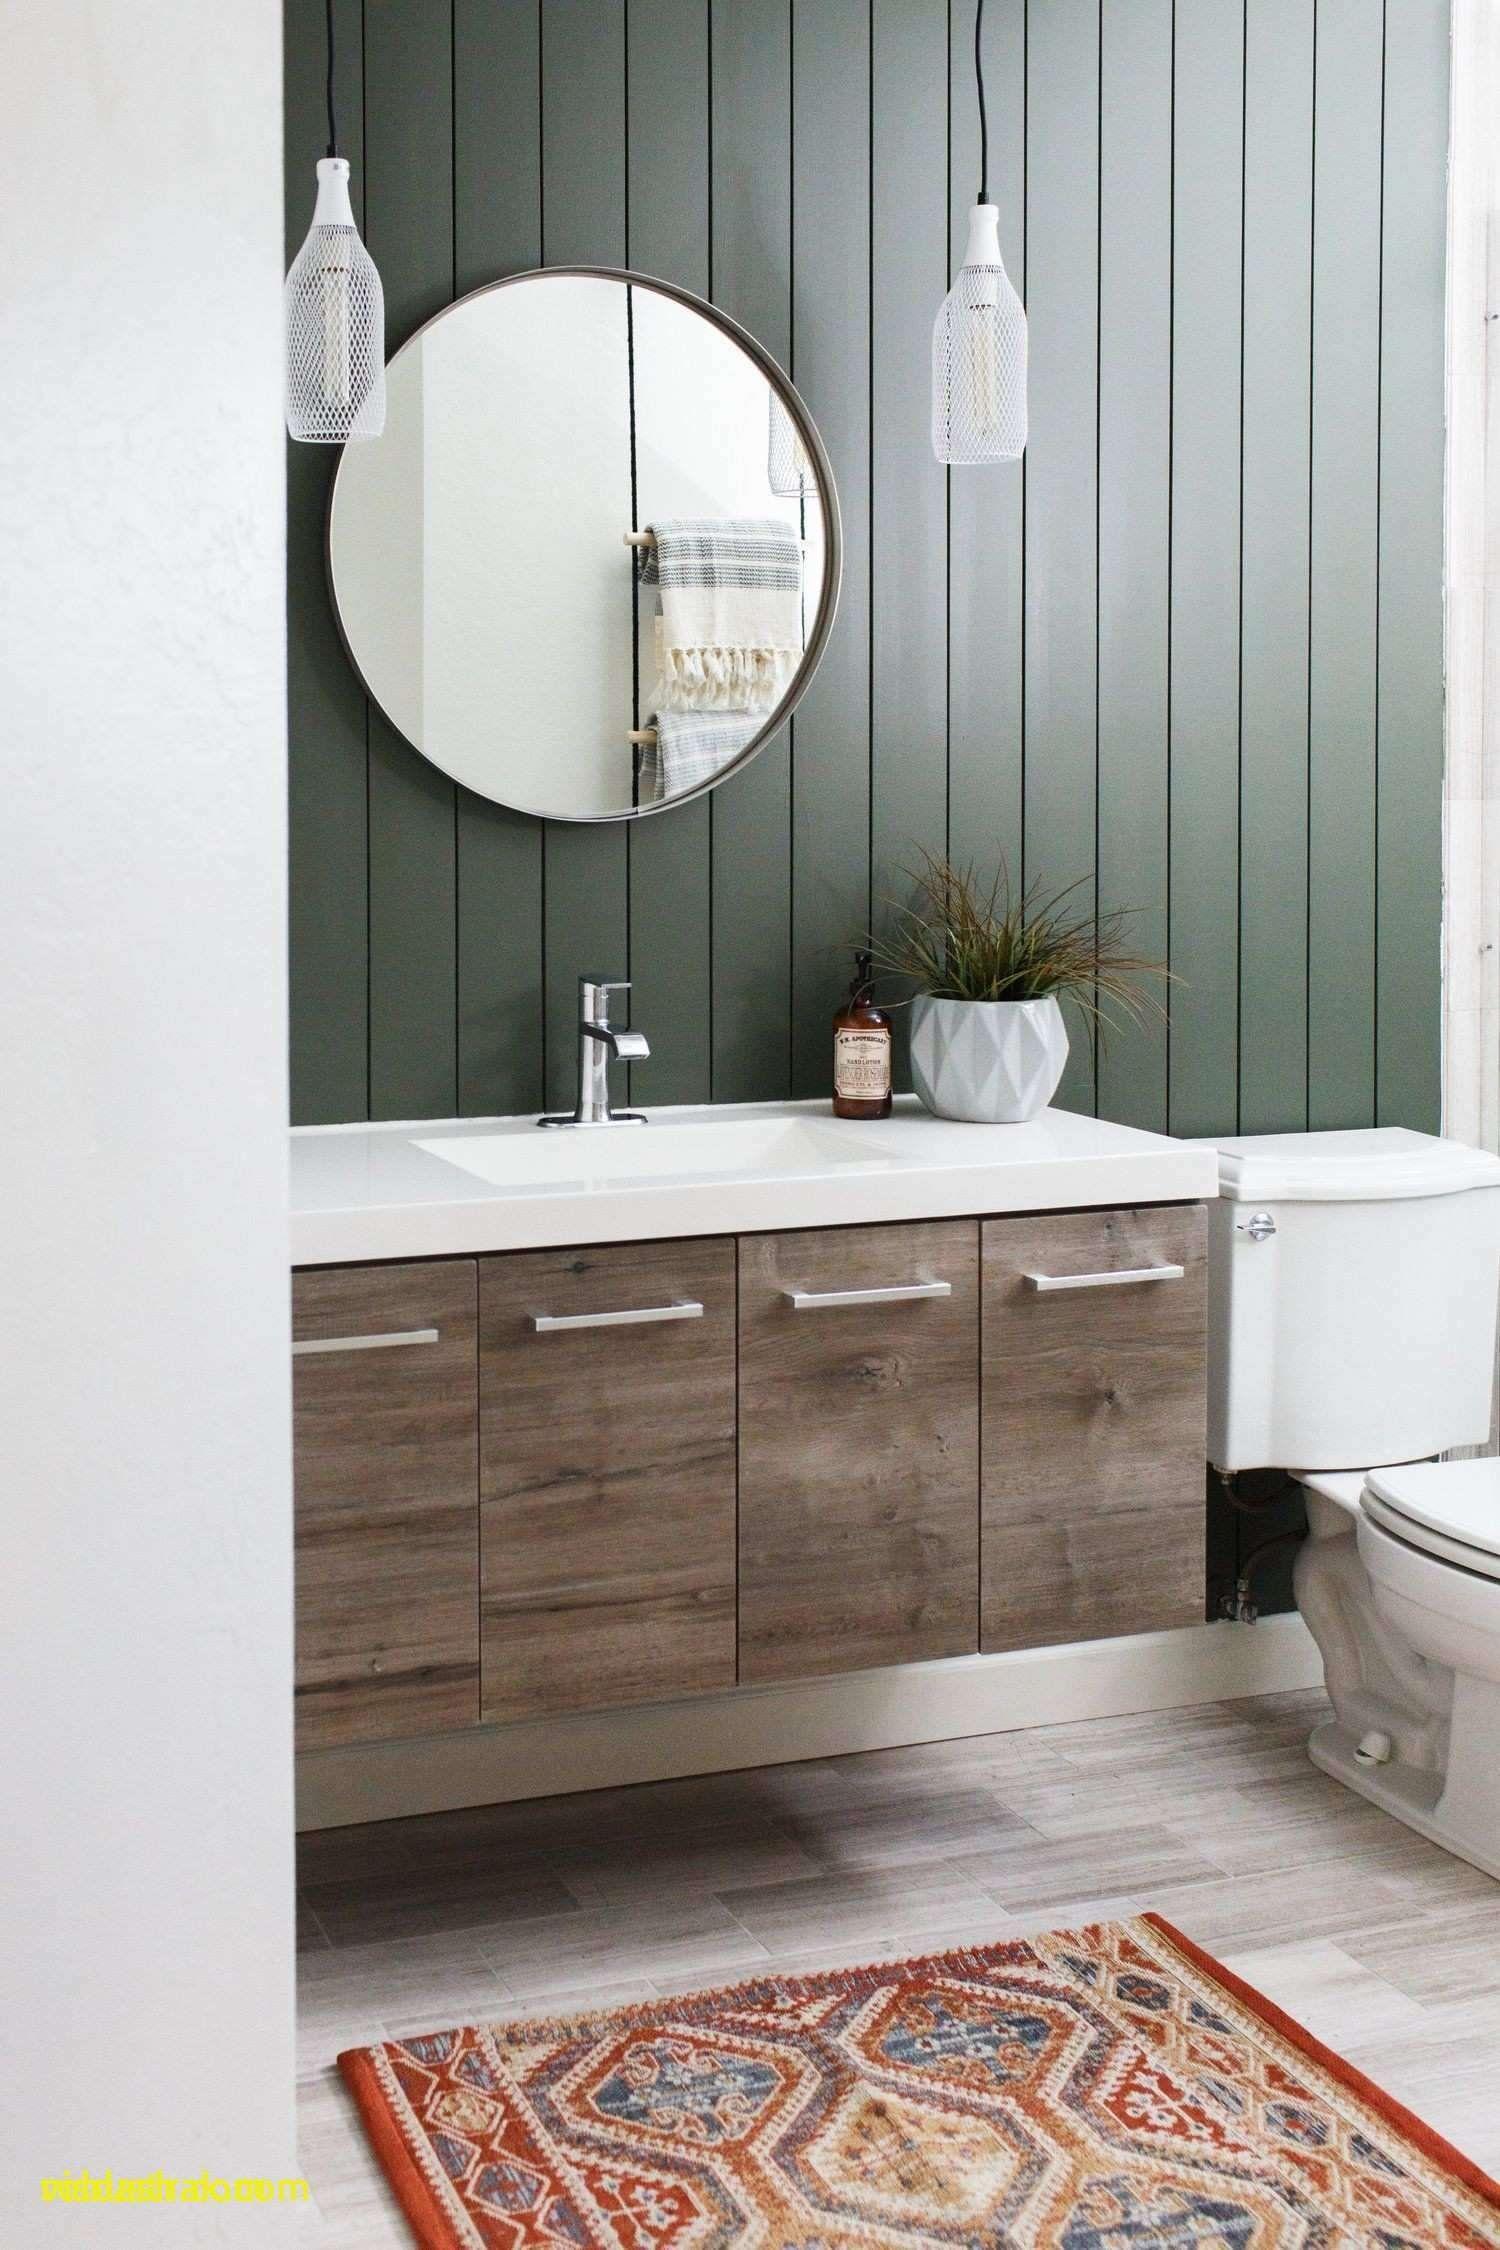 Interior design samples best of new bathroom design inspiration